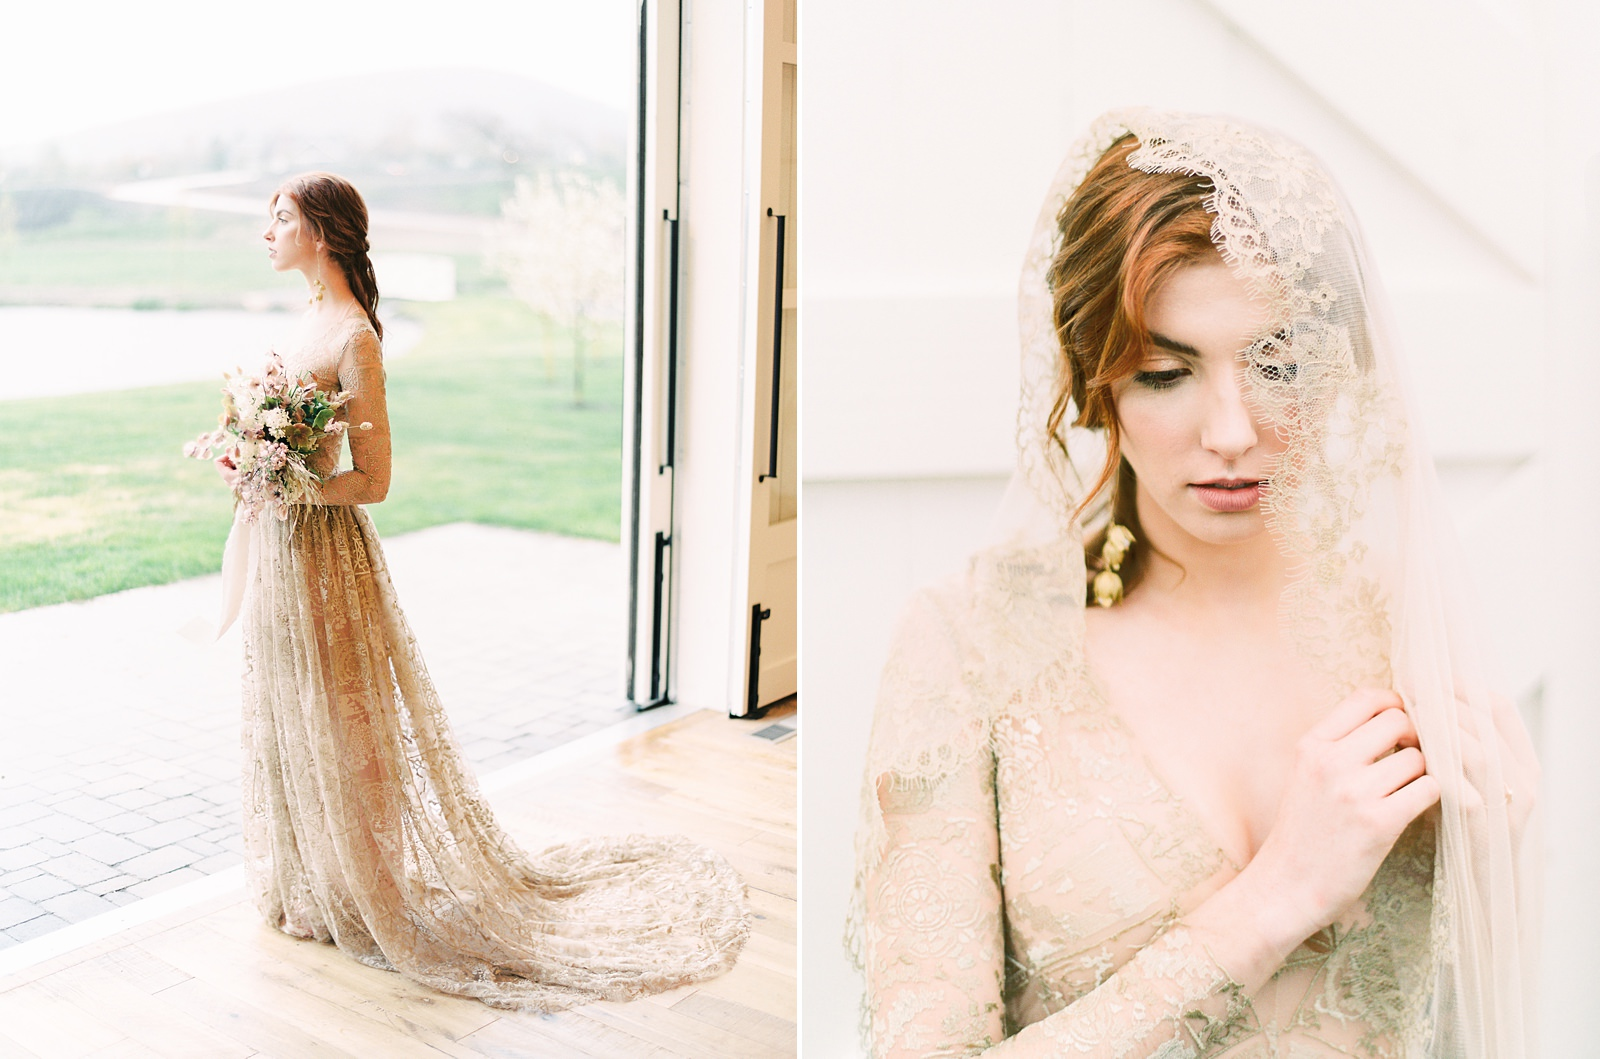 Heber Valley Natural Organic Wedding Inspiration at River Bottoms Ranch, Utah wedding photography, bride with long sleeve sheer lace wedding dress, vintage lace long veil